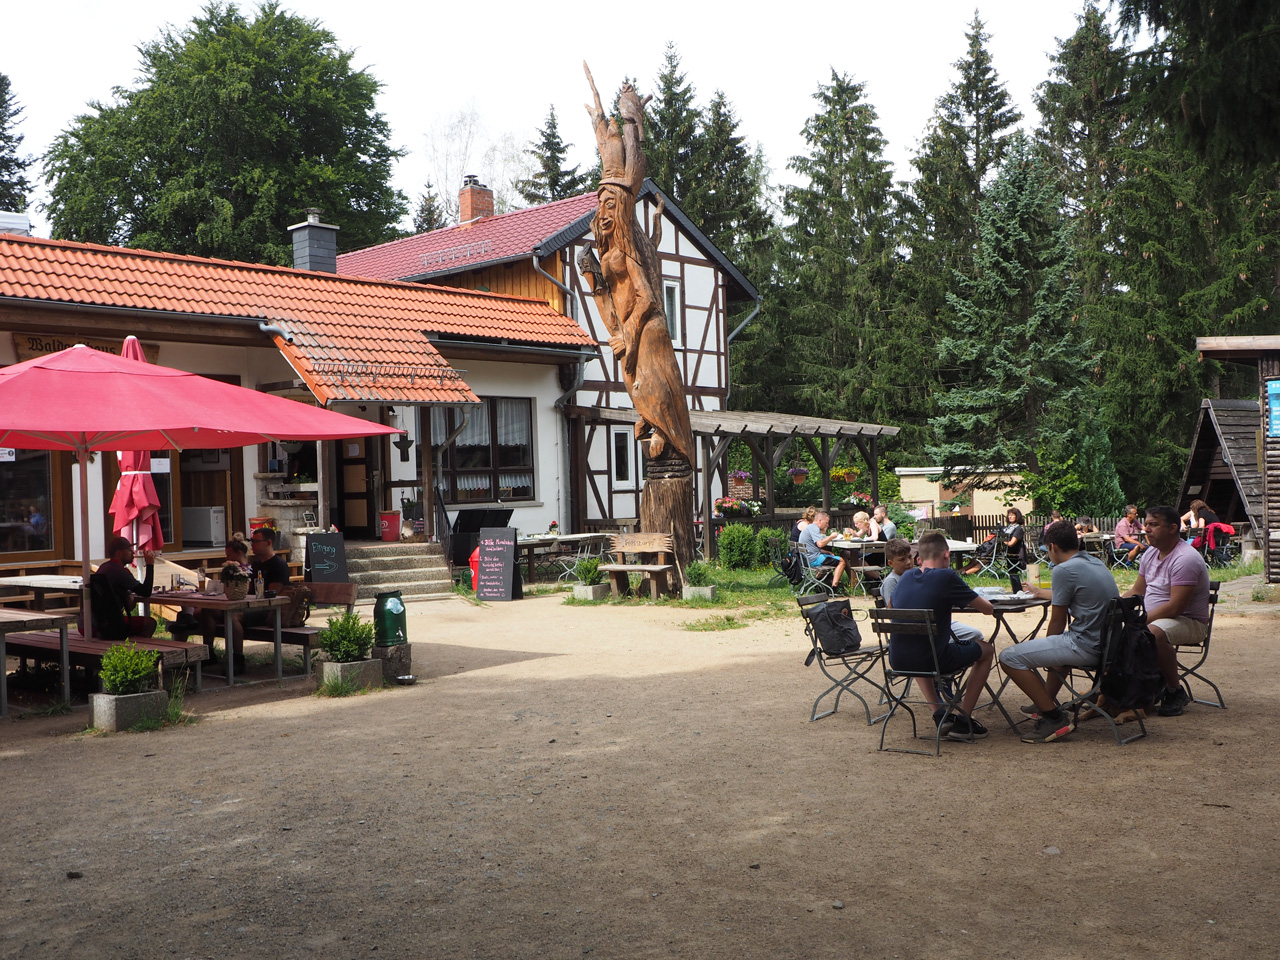 terras bij het Waldgasthaus Plessenburg